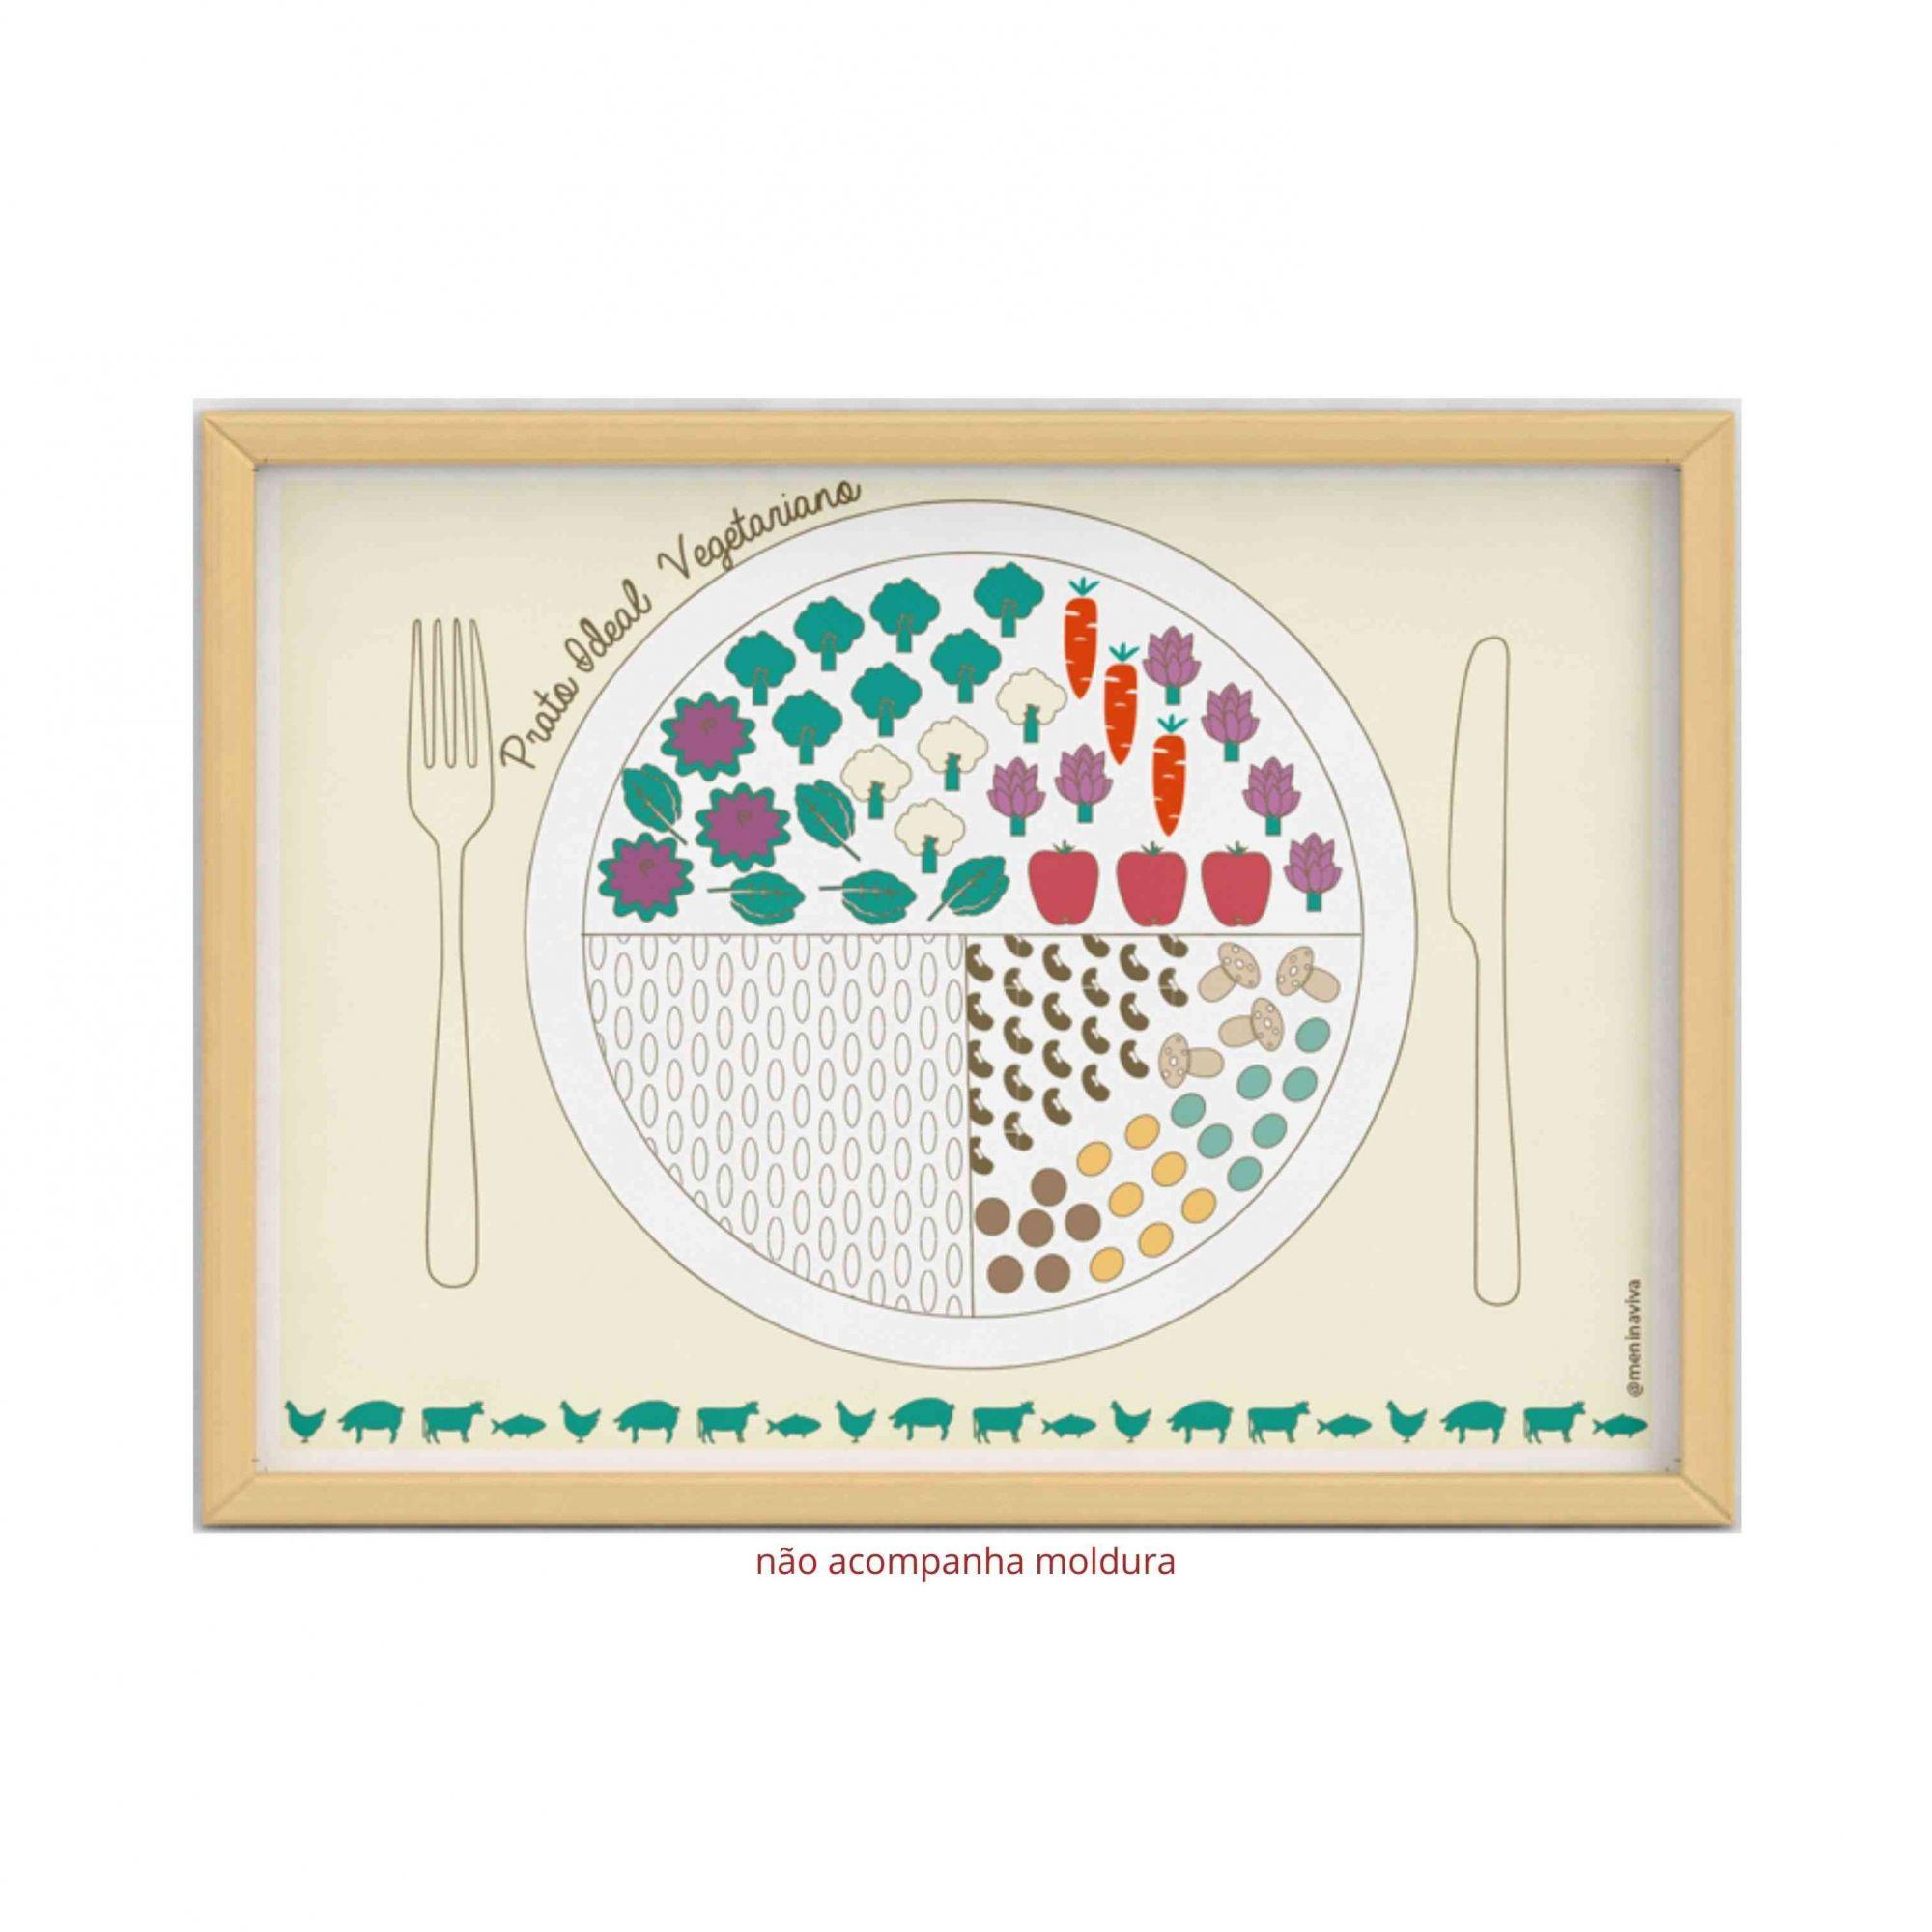 Pôster - Prato Ideal Vegetariano